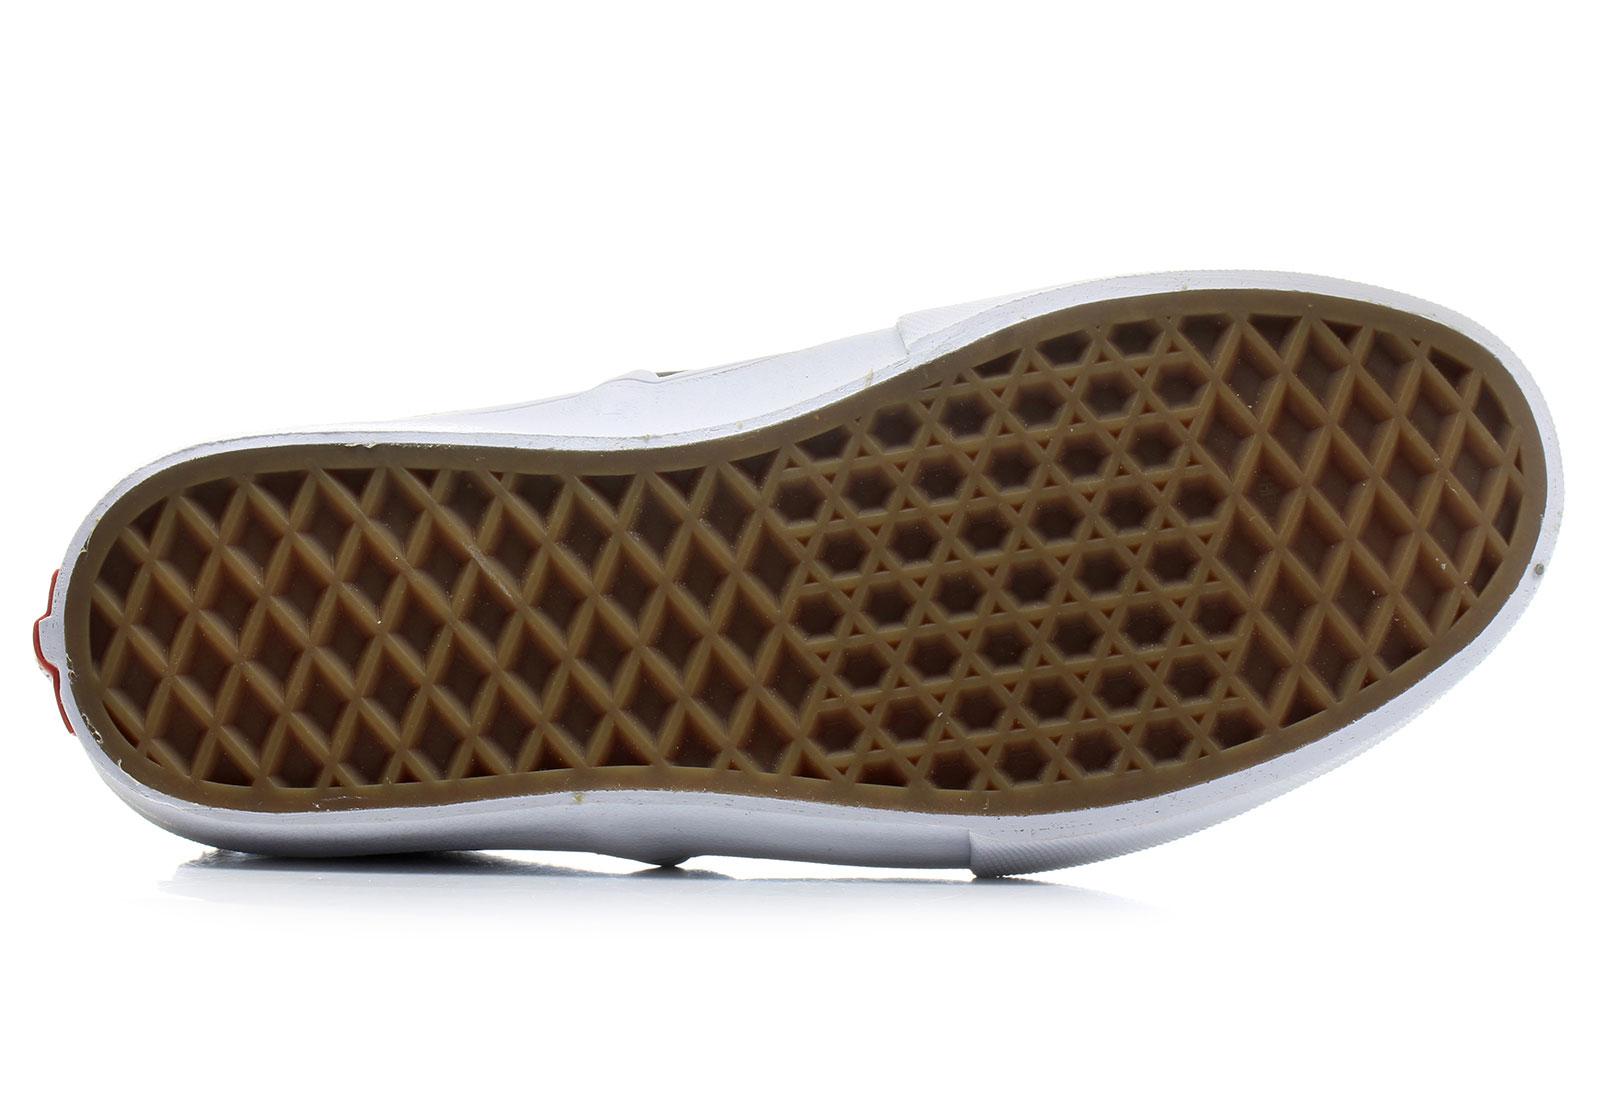 Vans Sneakers - Chima Ferguson Pro - VXKZIPI - Online shop for ...